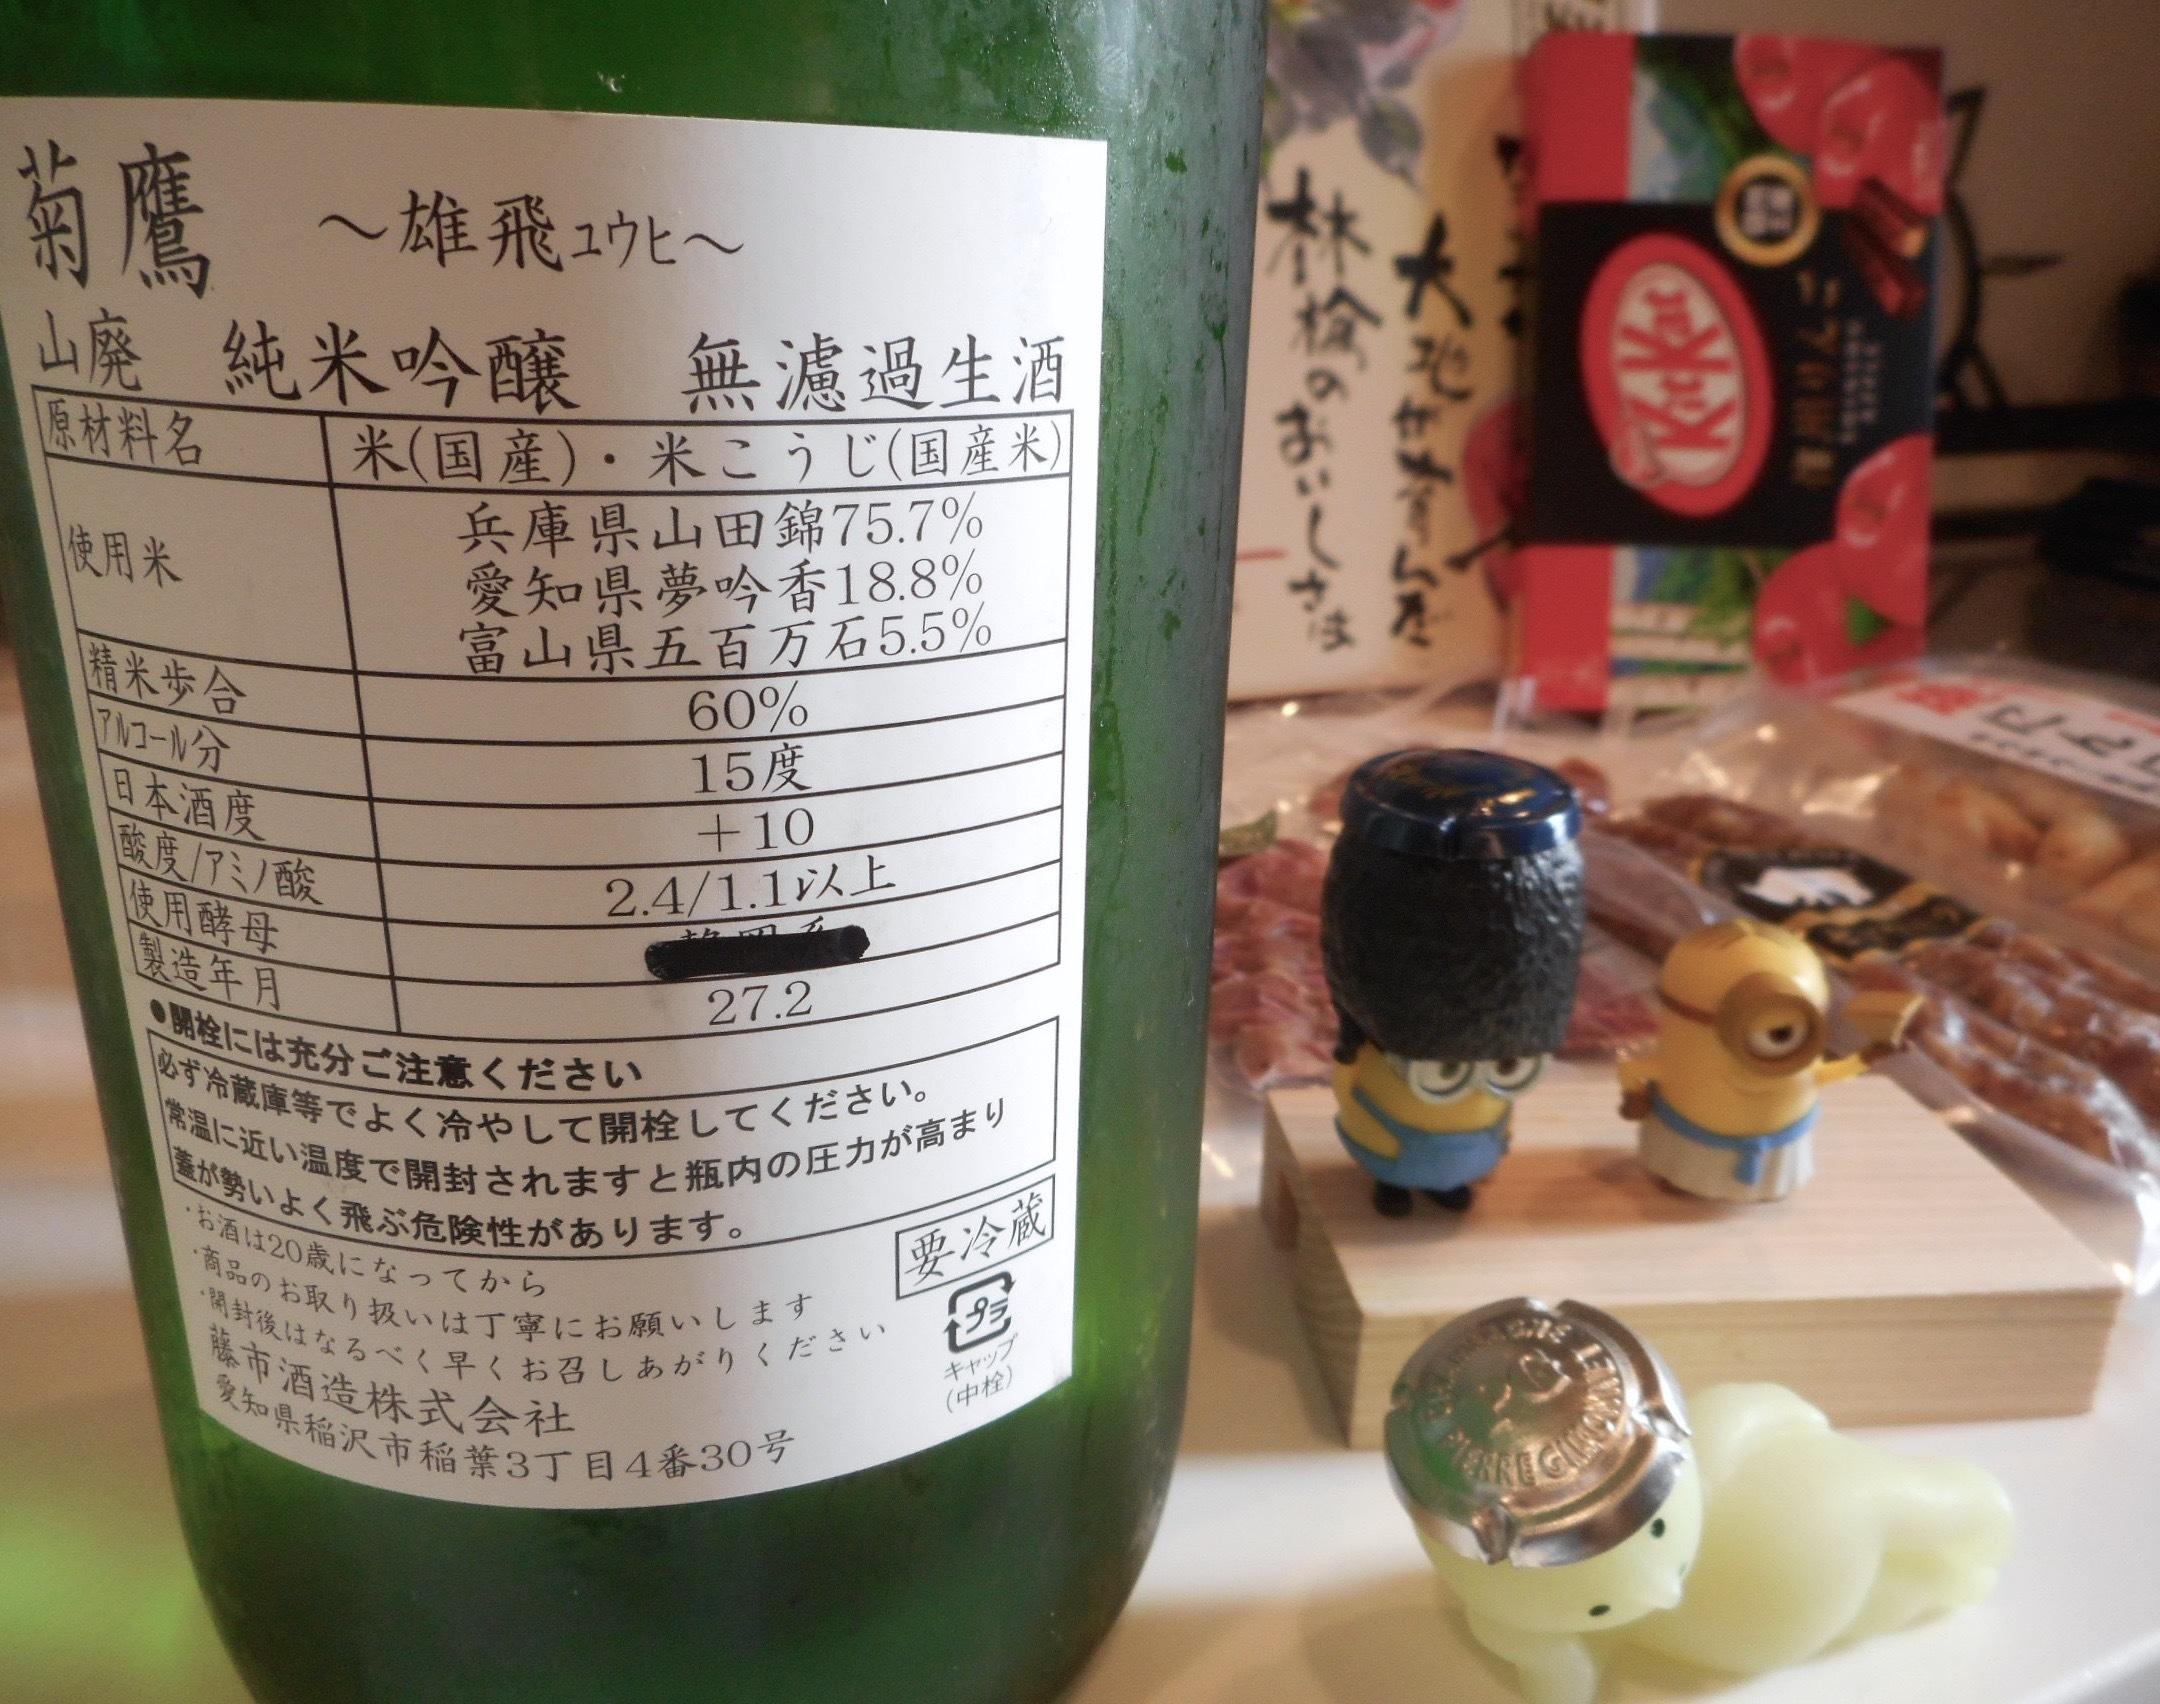 kikutaka_yuuhi_2nen_jukusei2.jpg